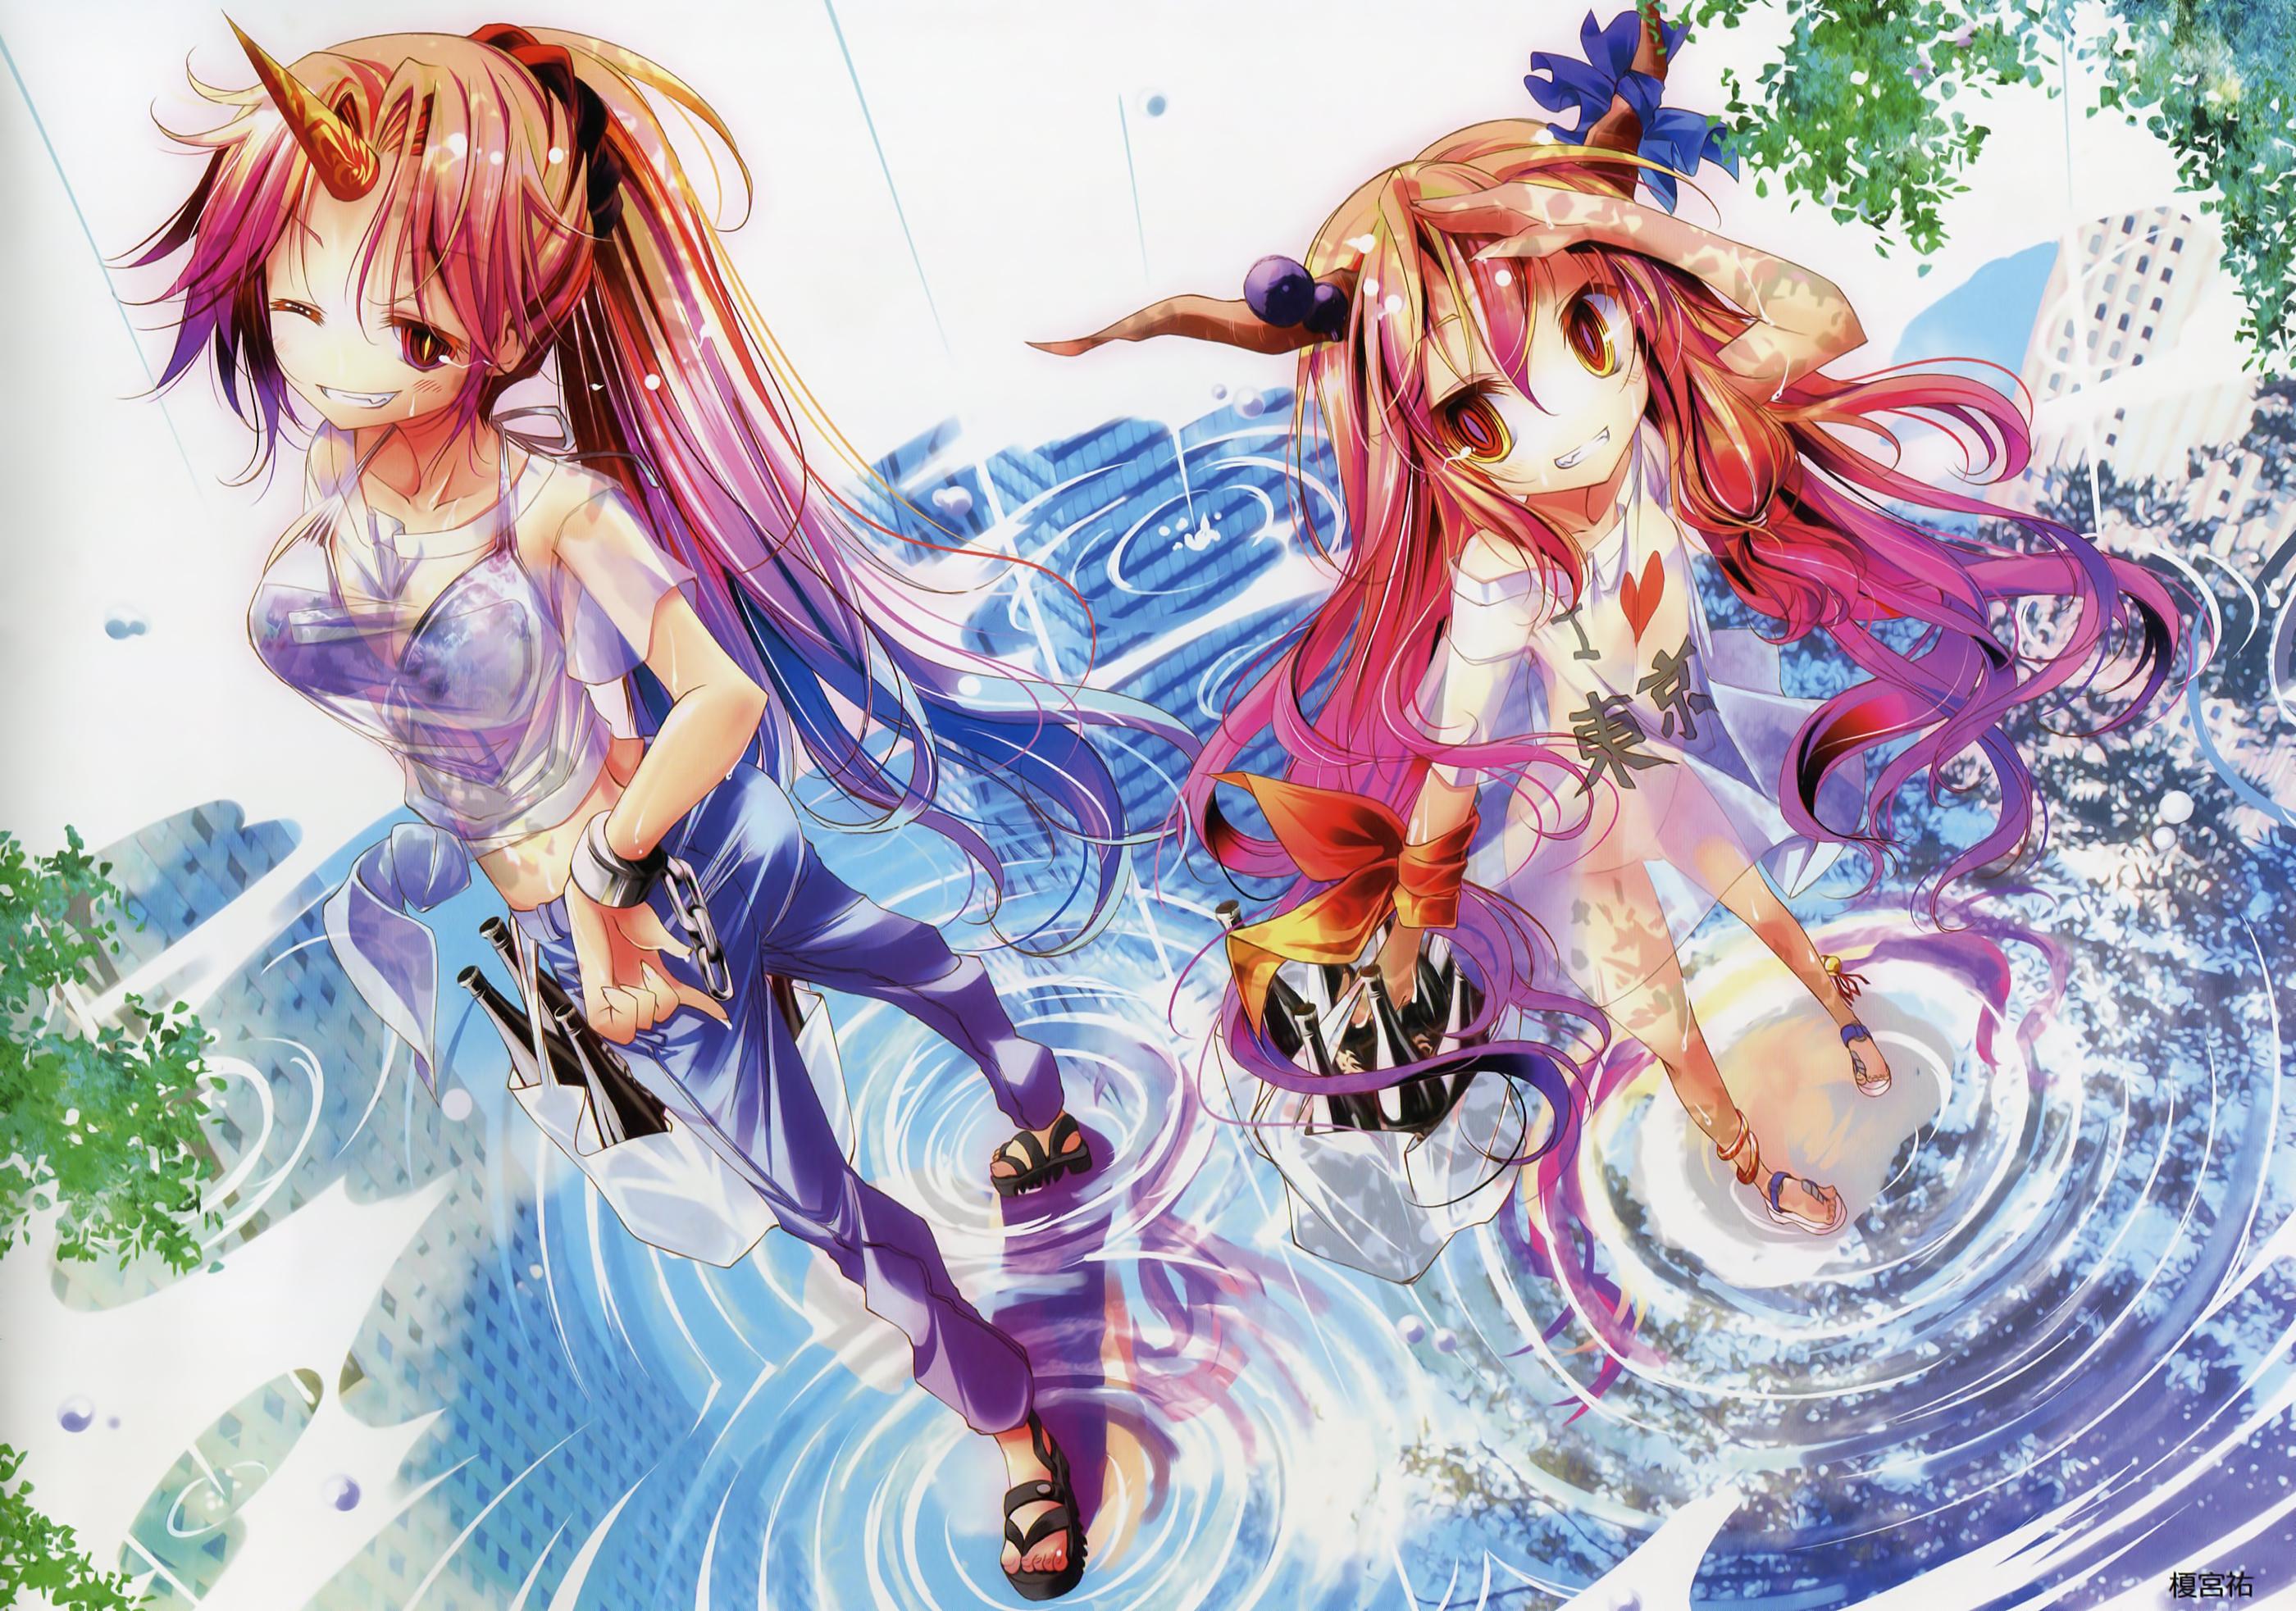 Suika Ibuki Wallpaper And Scan Gallery Minitokyo